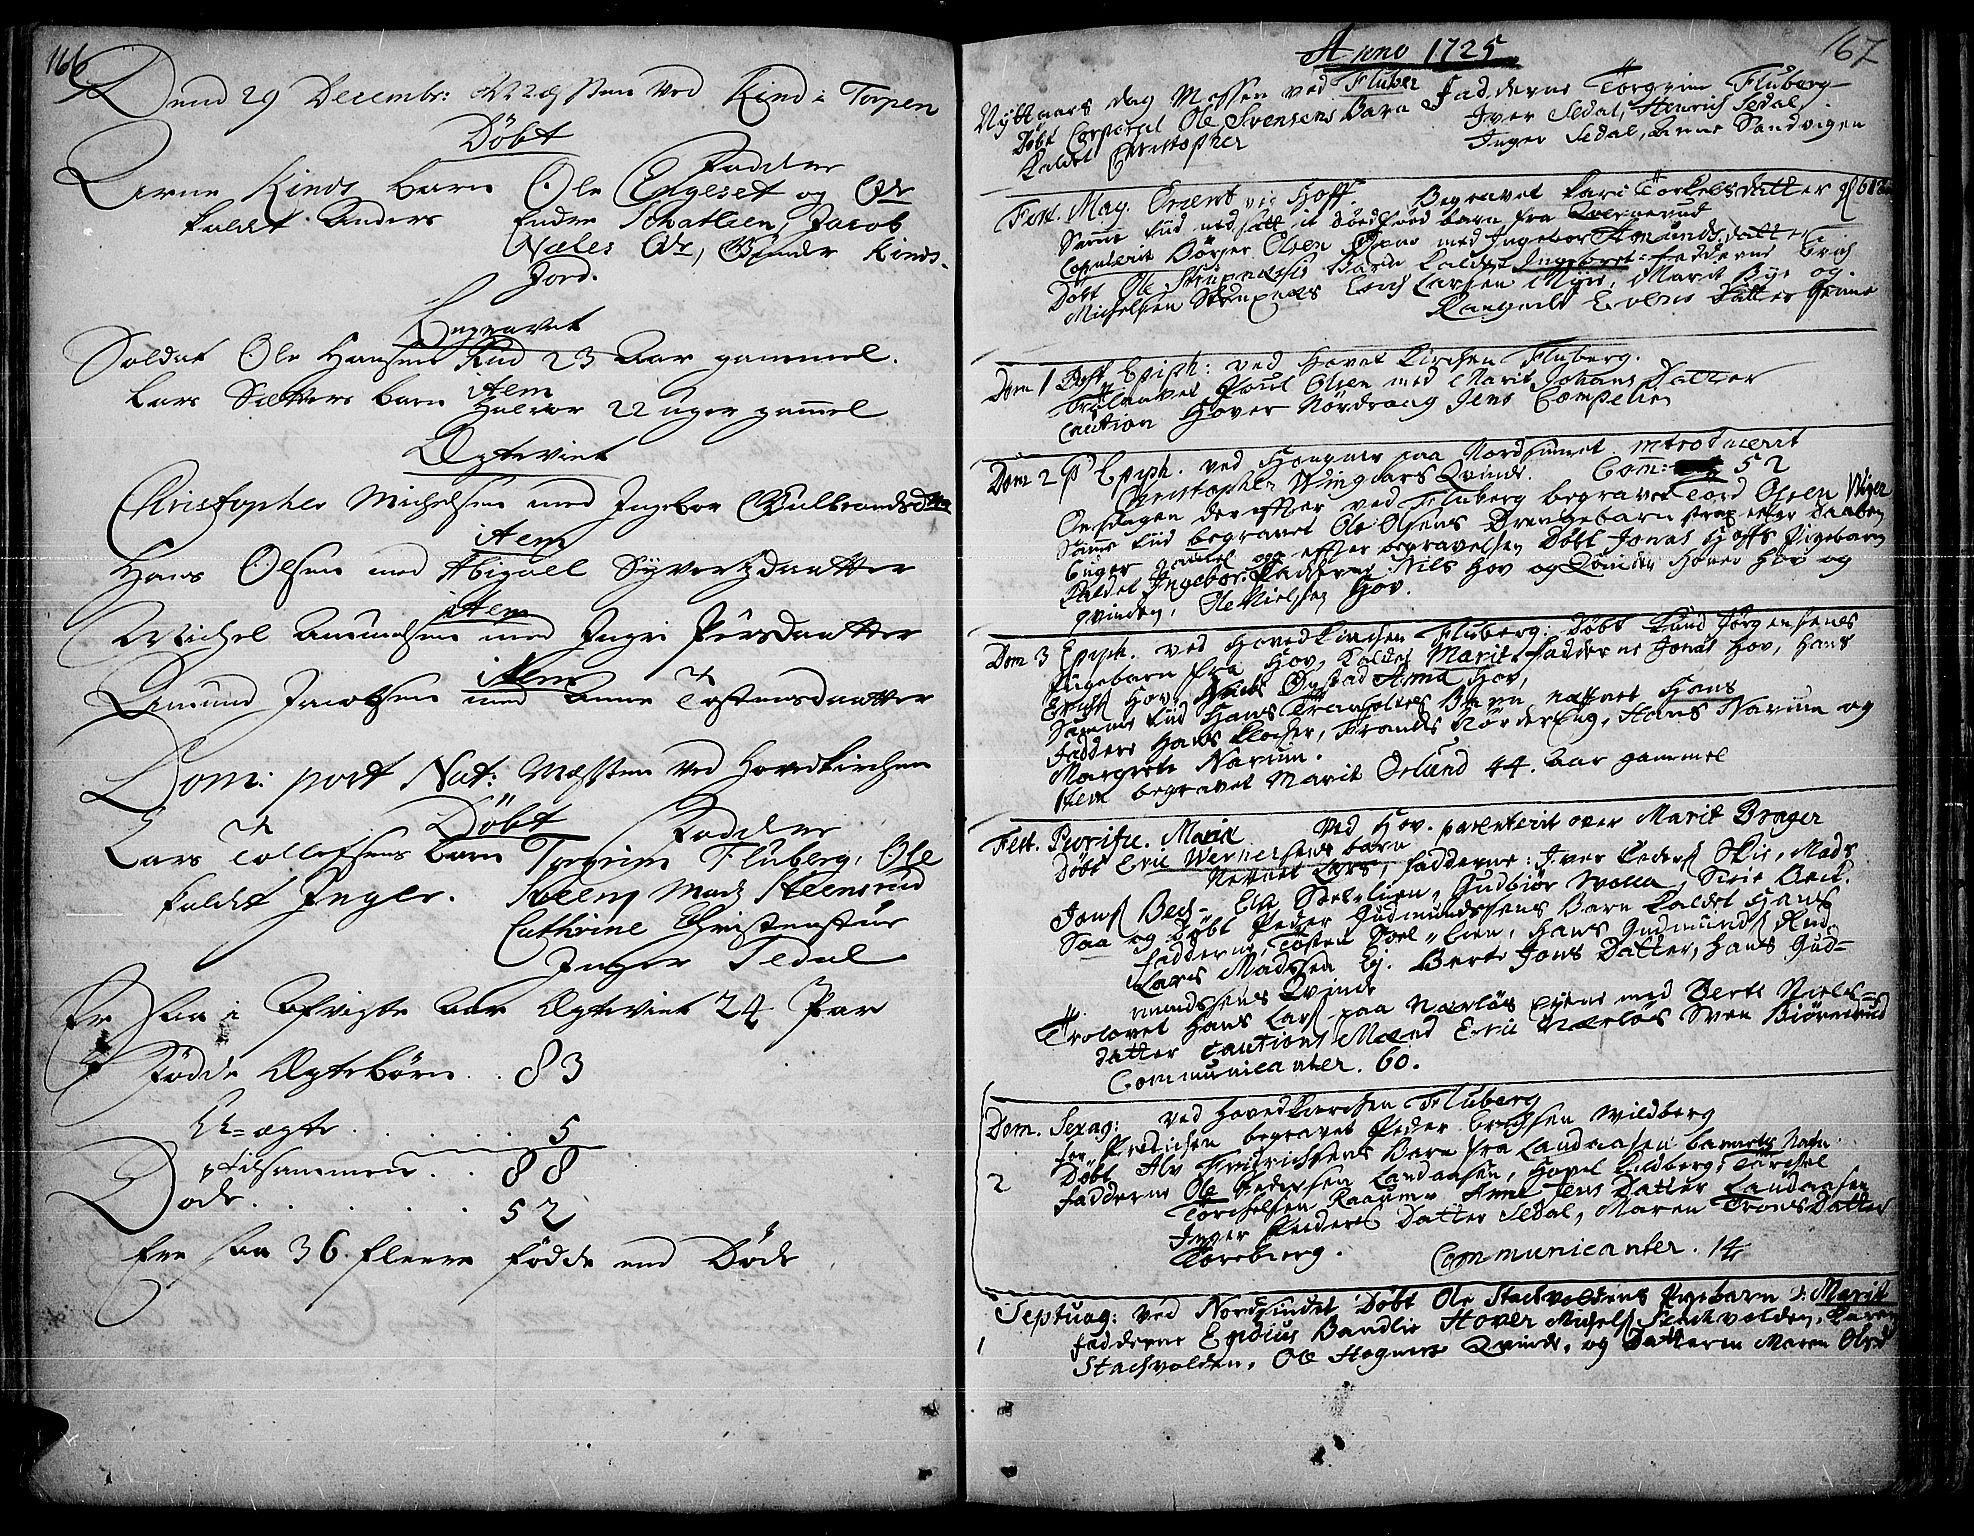 SAH, Land prestekontor, Ministerialbok nr. 1, 1708-1732, s. 166-167